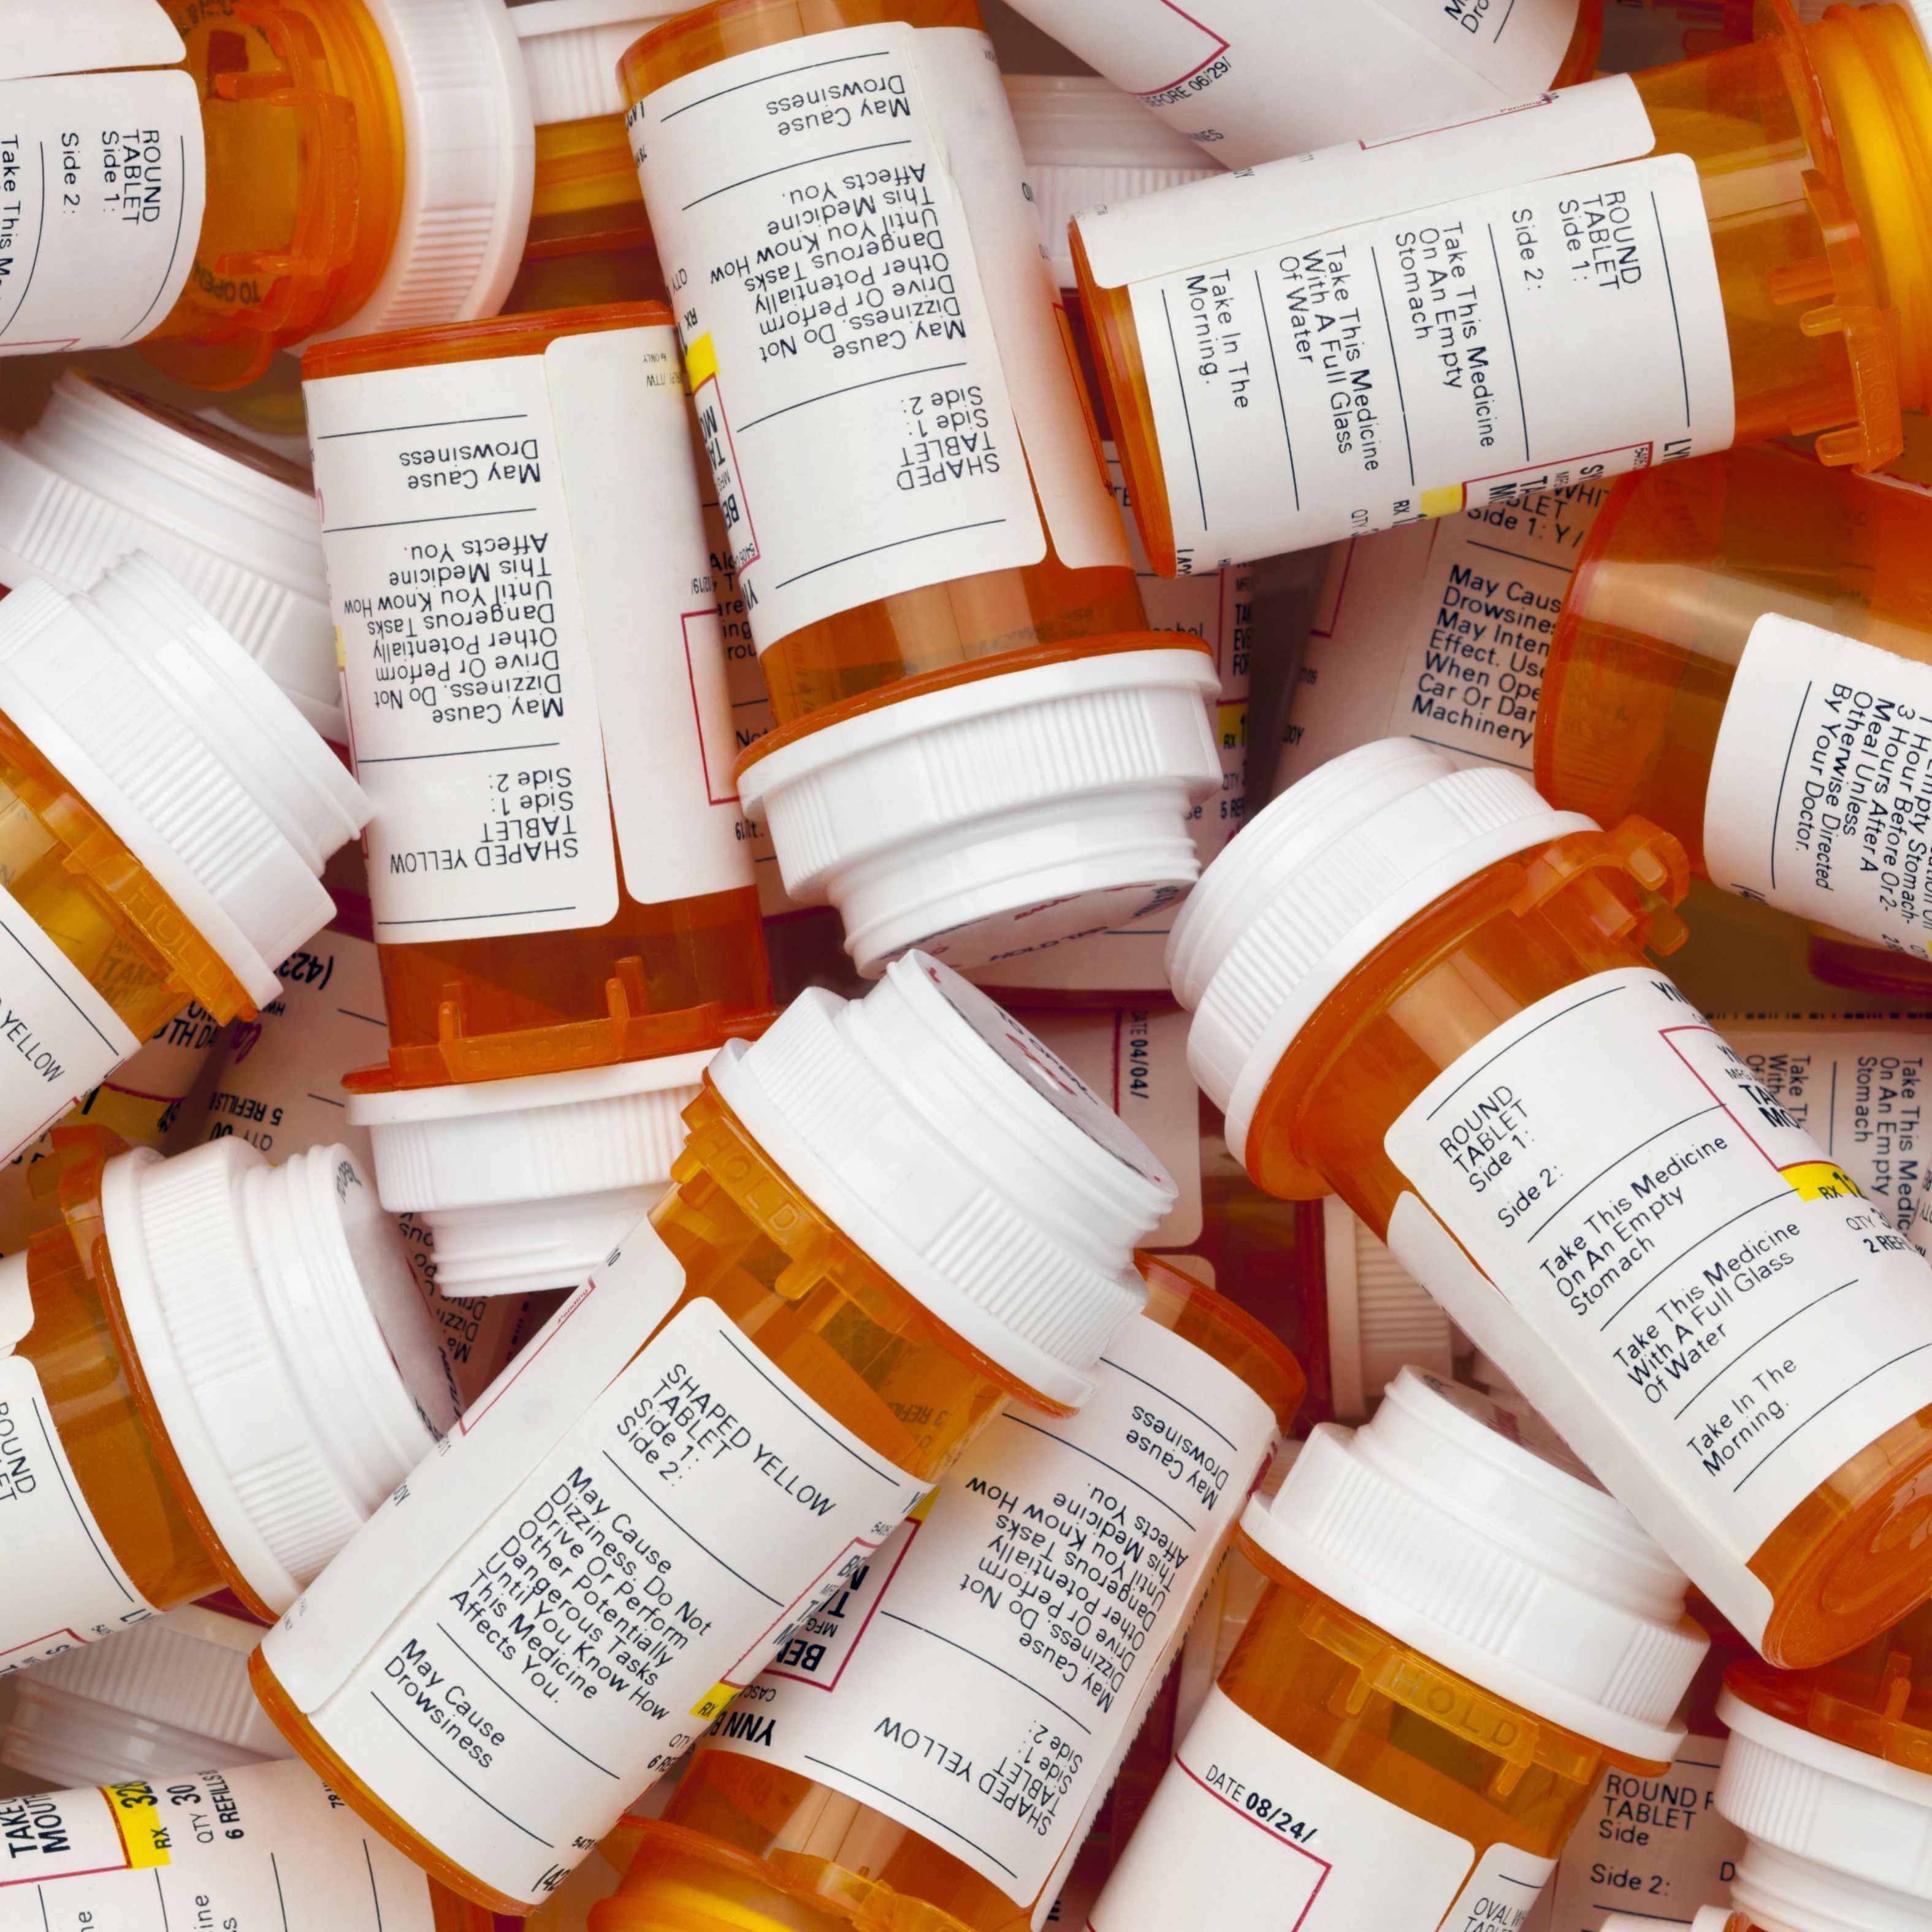 a collection of prescription pill bottles